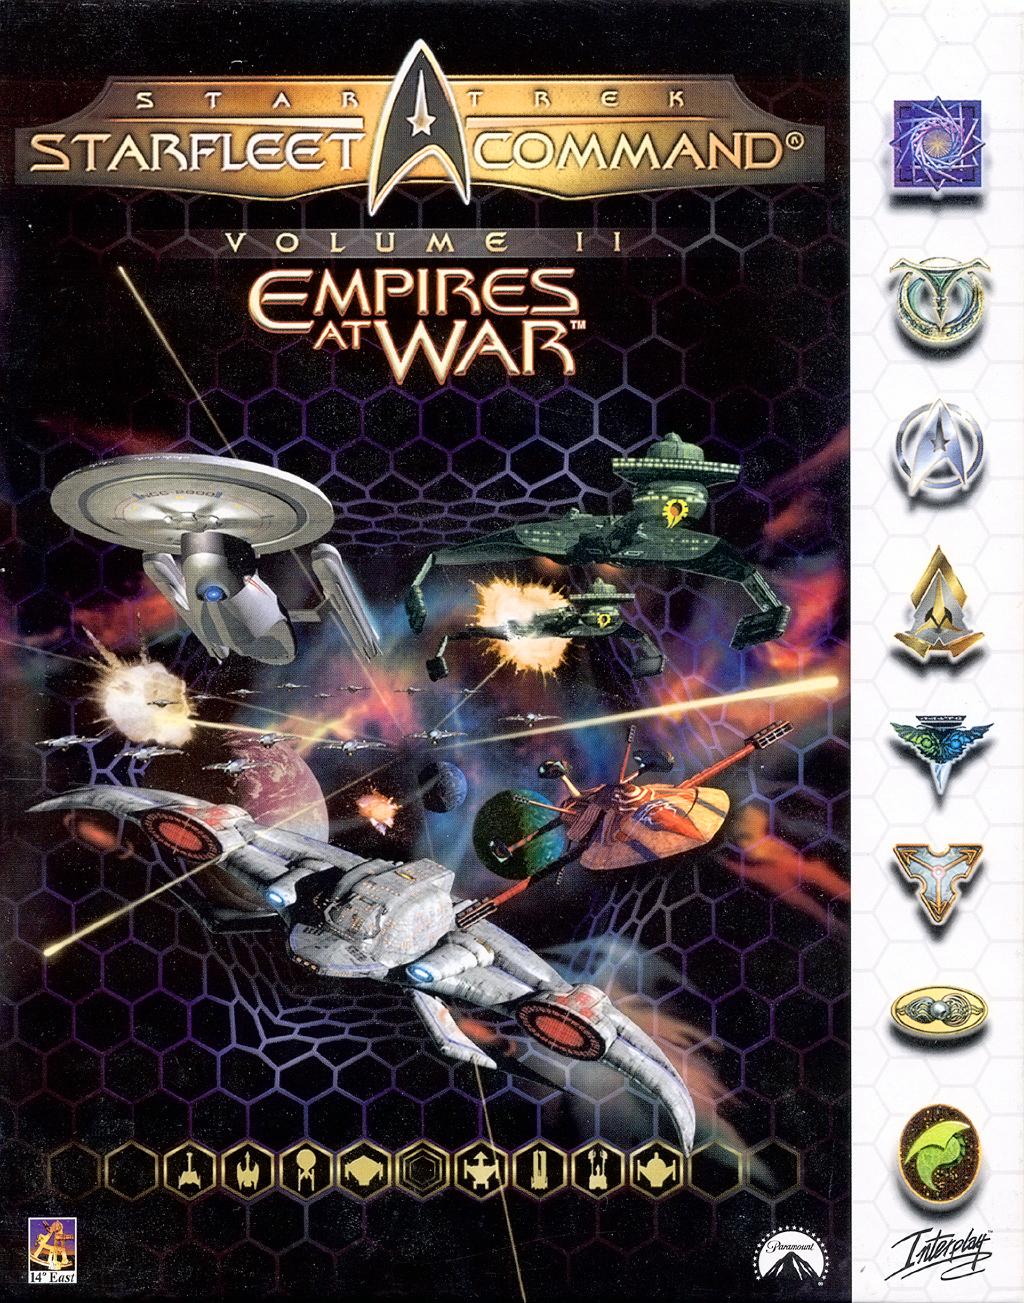 Starfleet command: commmunity edition games quarter to three.